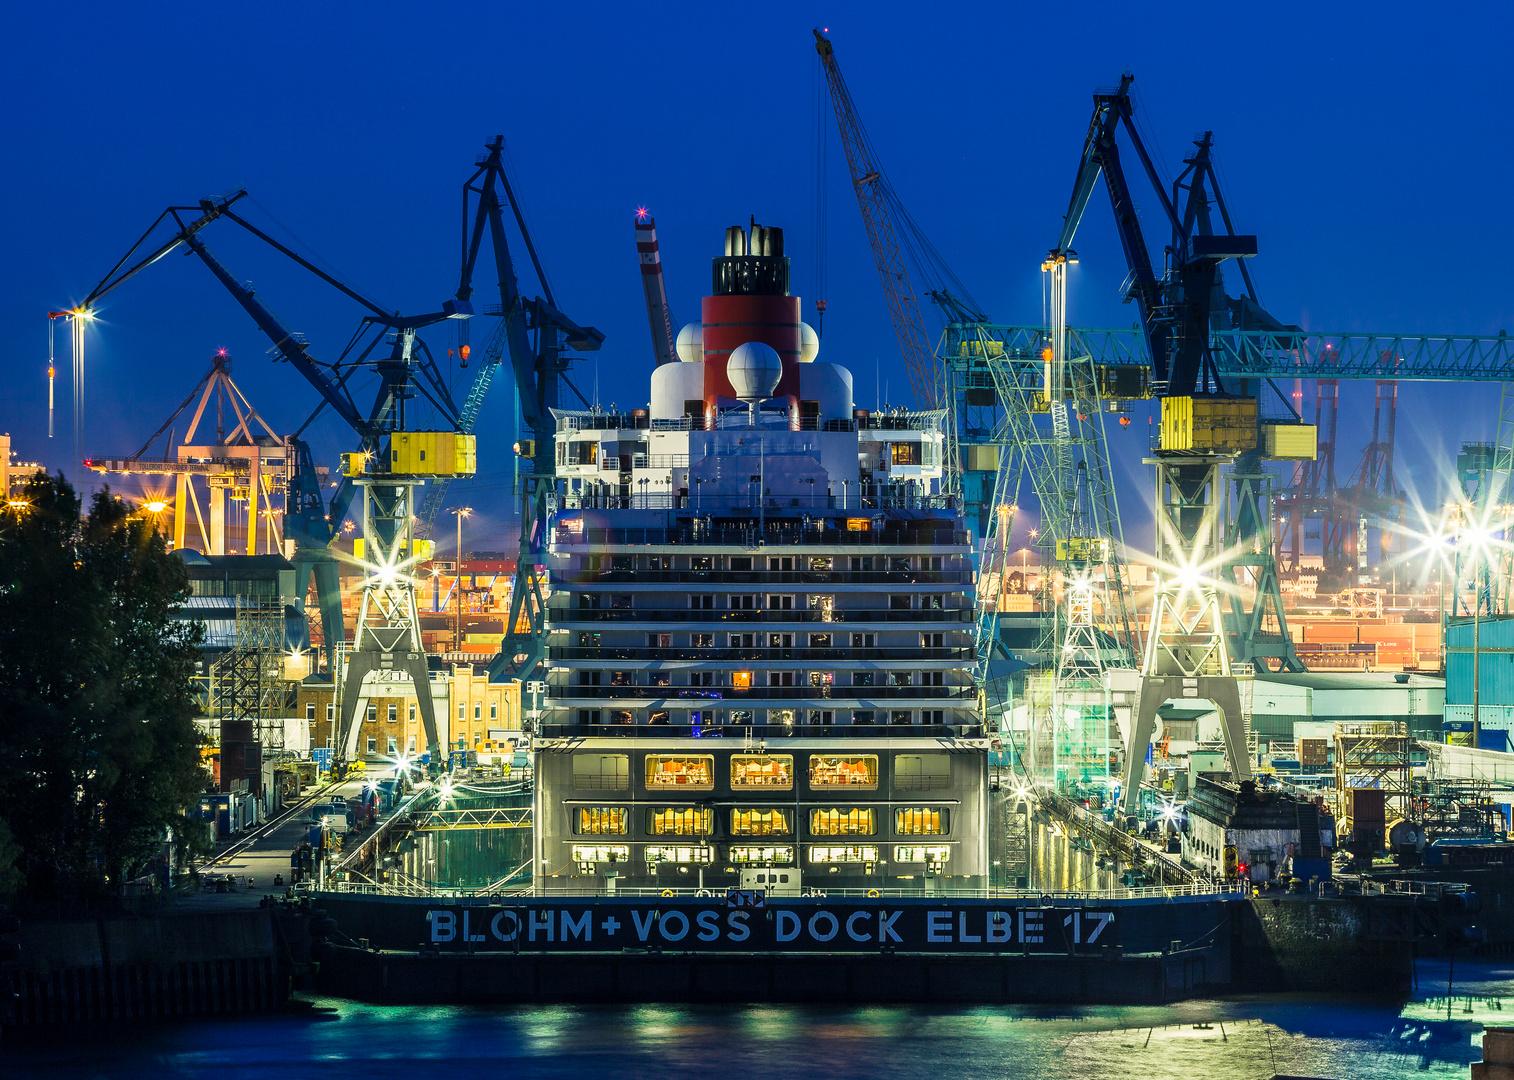 Queen Elizabeth in den Blohm&Voss Docks